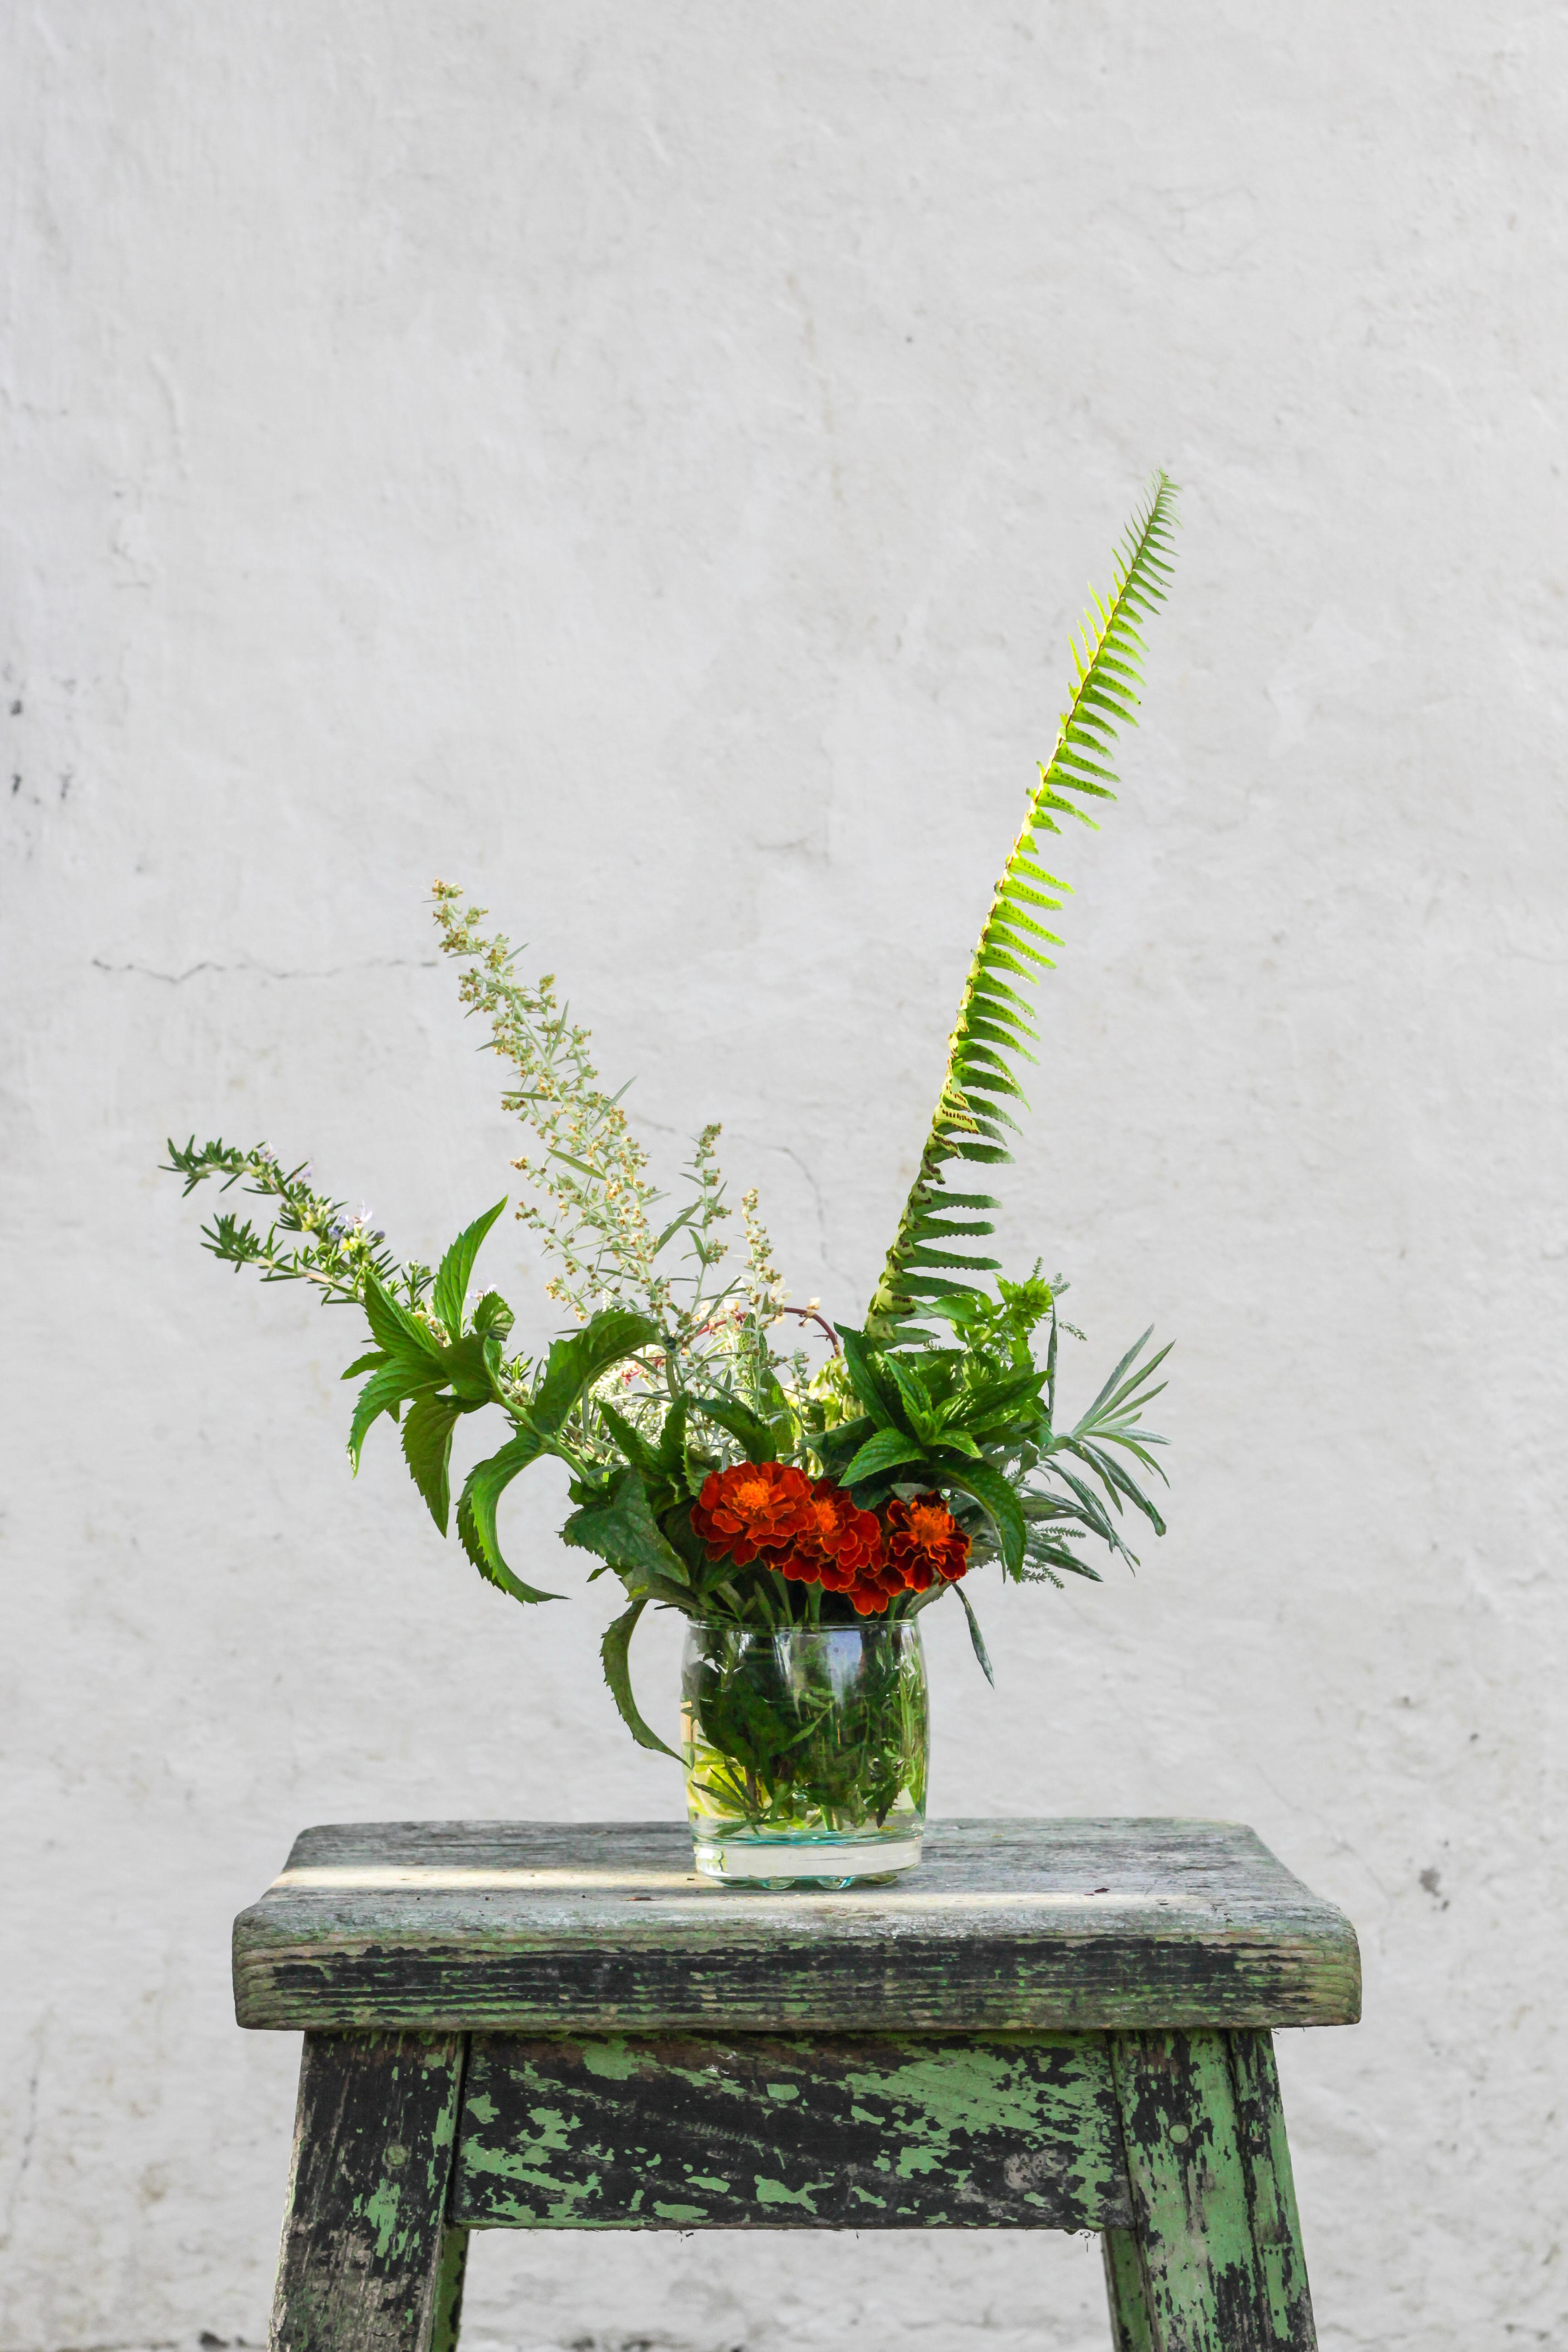 images gratuites branche plante feuille fleur tabouret verre vase vert botanique. Black Bedroom Furniture Sets. Home Design Ideas